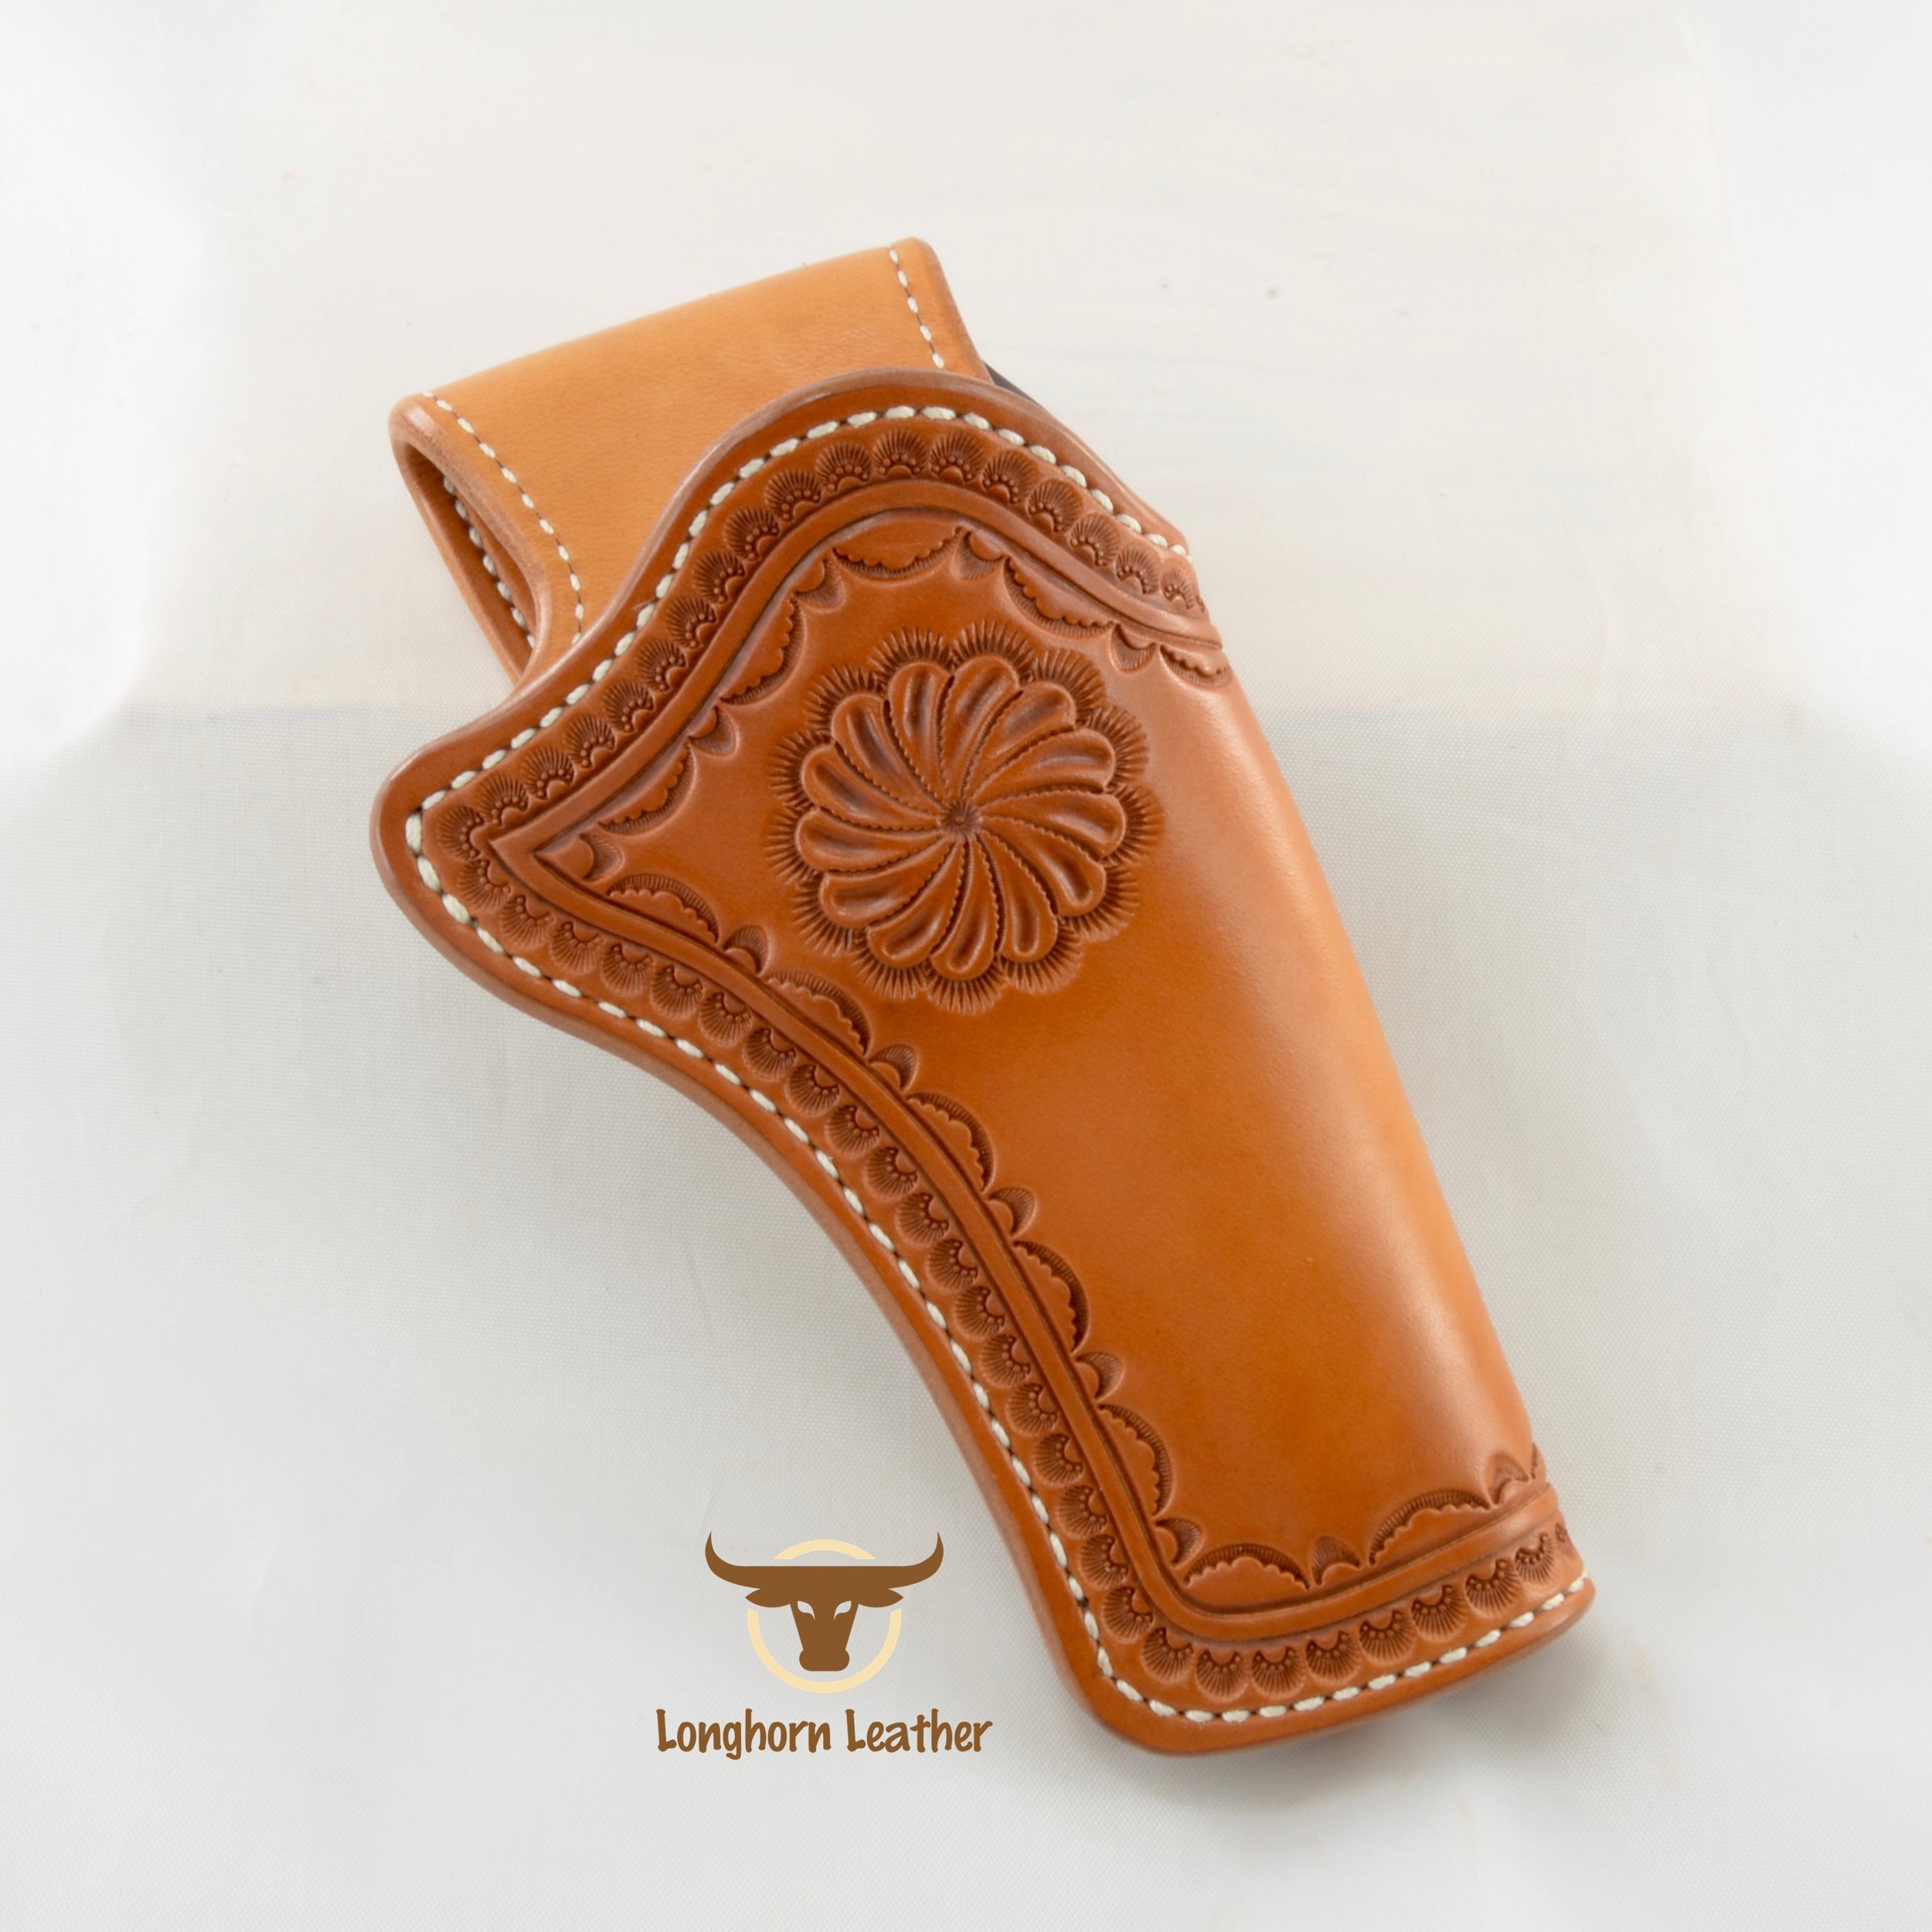 Ruger SP101 holster and gun belt featuring the Rio Verde design - Longhorn Leather AZ